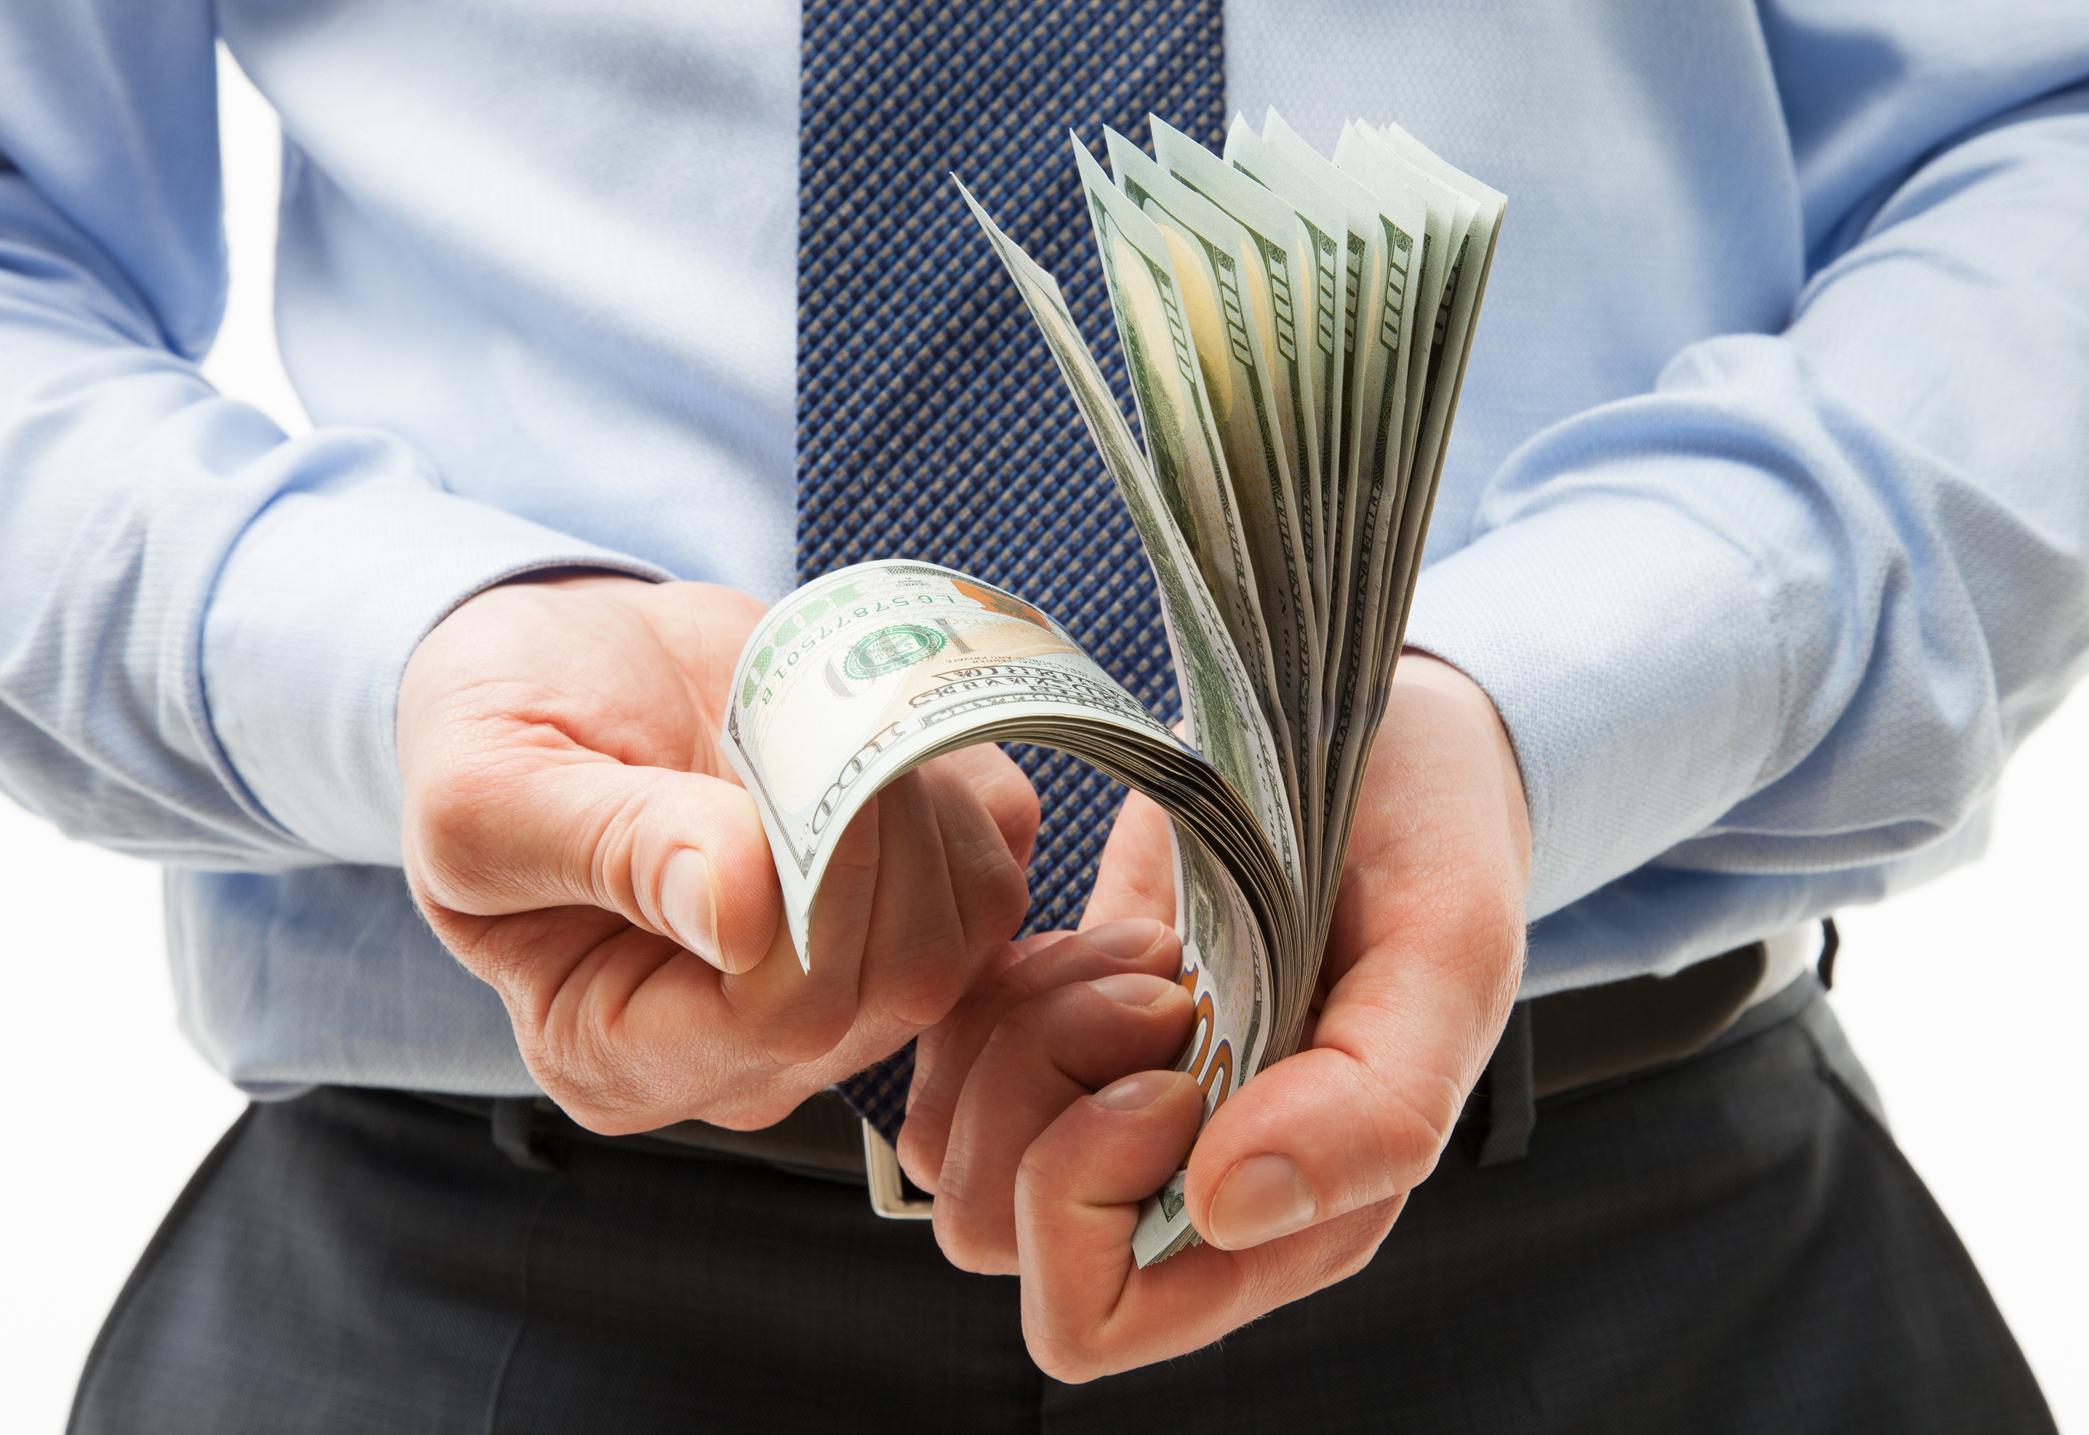 A man flipping through a stack of $100 bills